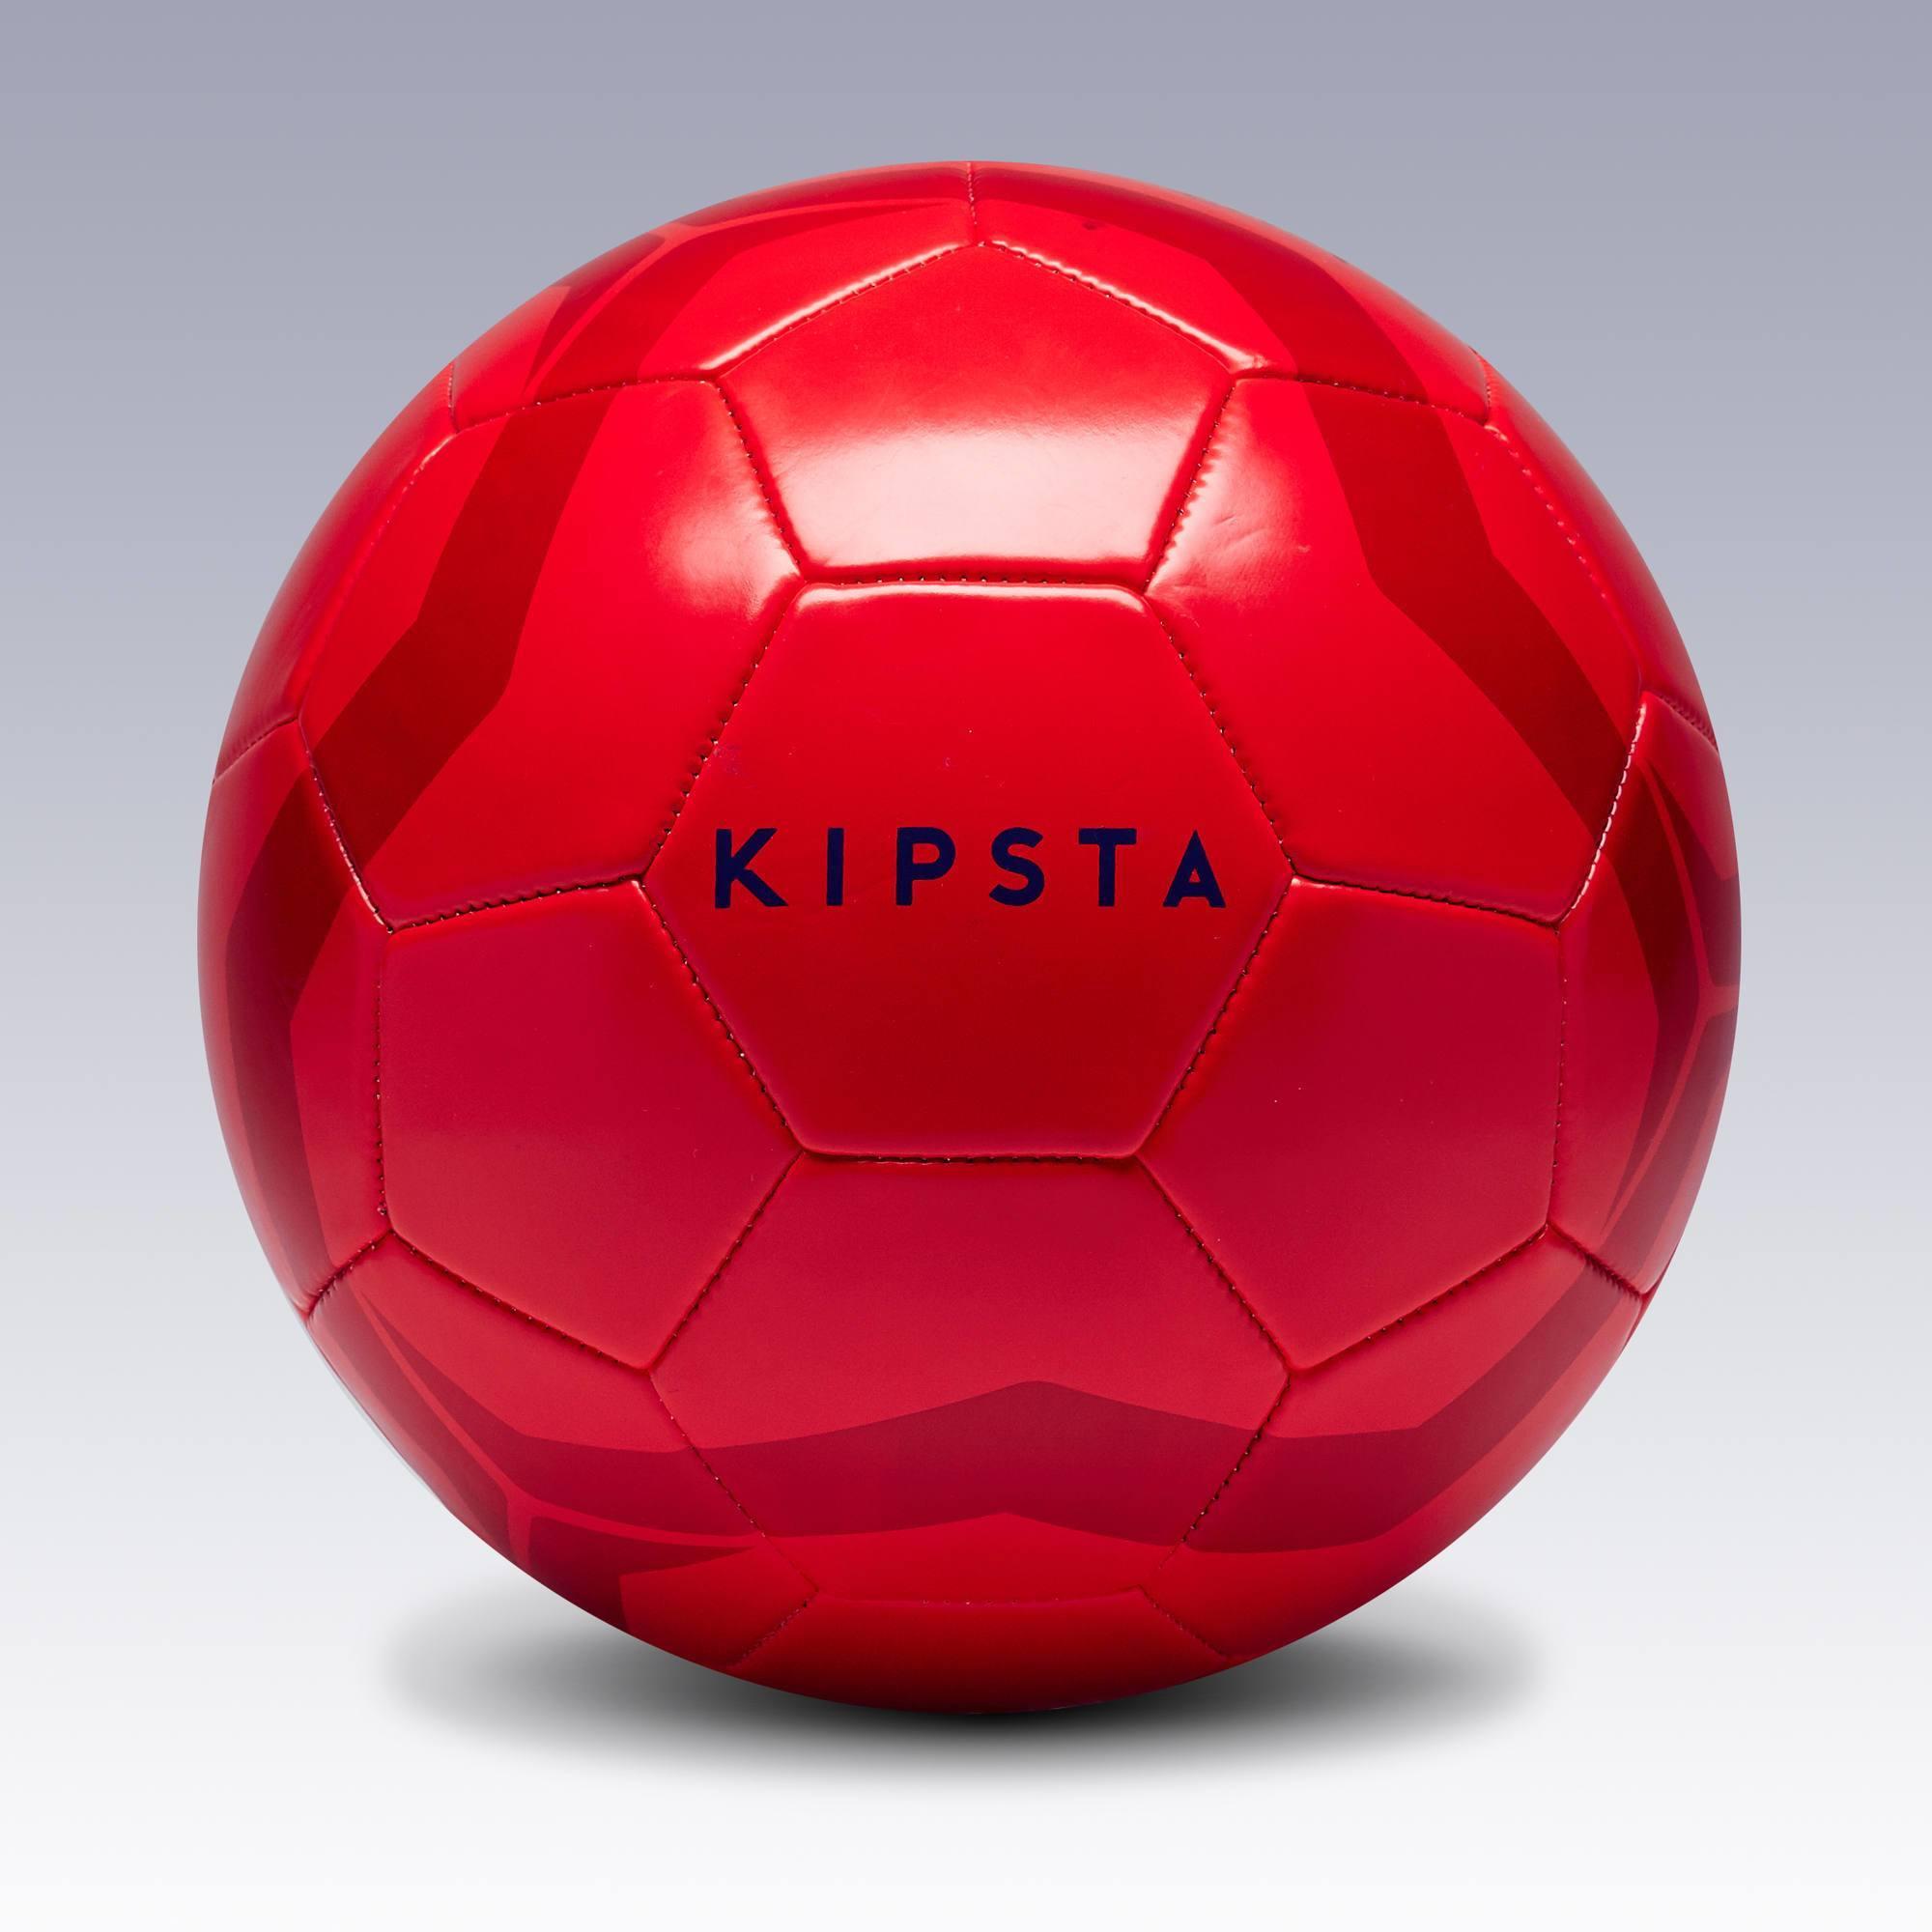 Meilleur de image a imprimer ballon de foot - Image de foot a imprimer ...